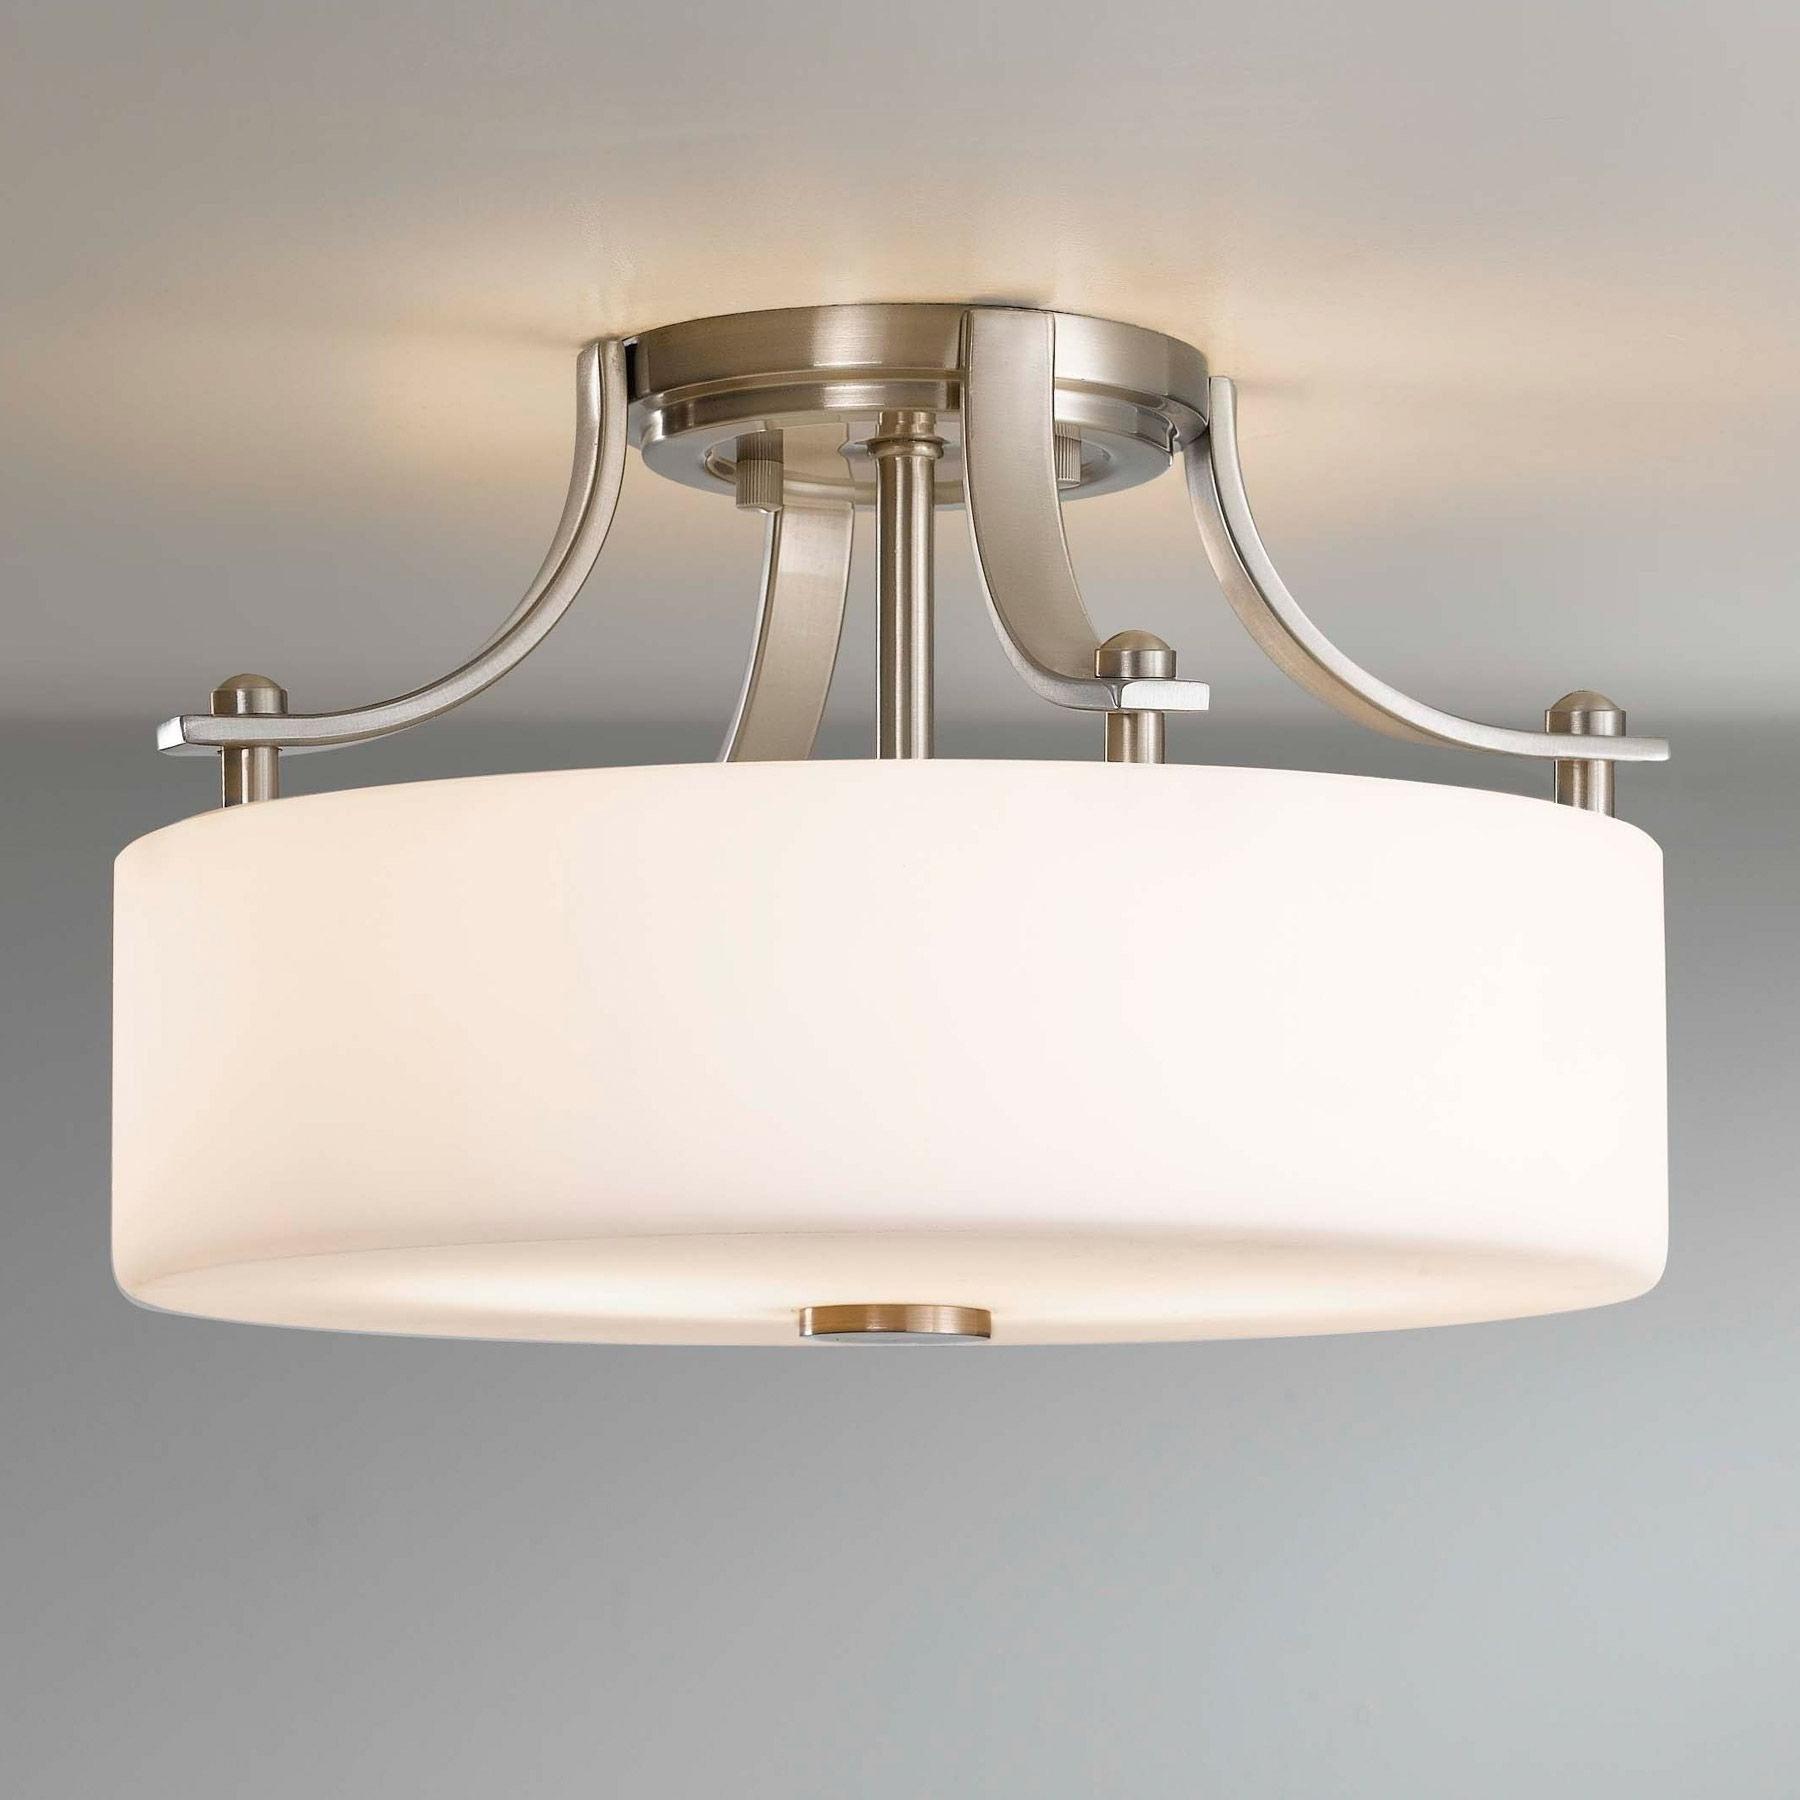 Bathroom Ceiling Light Fixture – Inspirational White Flushmount Regarding Popular Chandelier Bathroom Ceiling Lights (View 6 of 15)